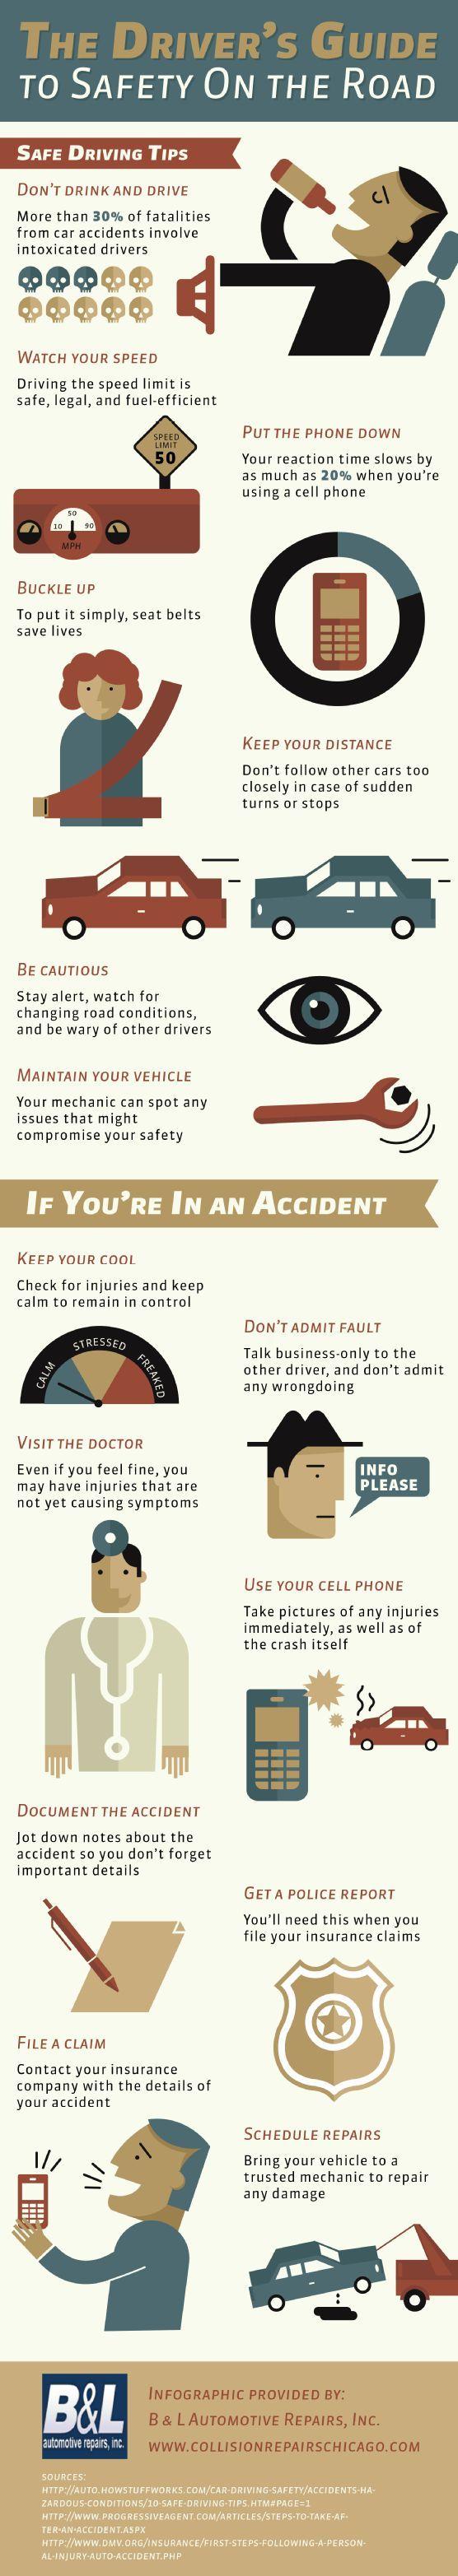 infographic-driving-safe.jpg